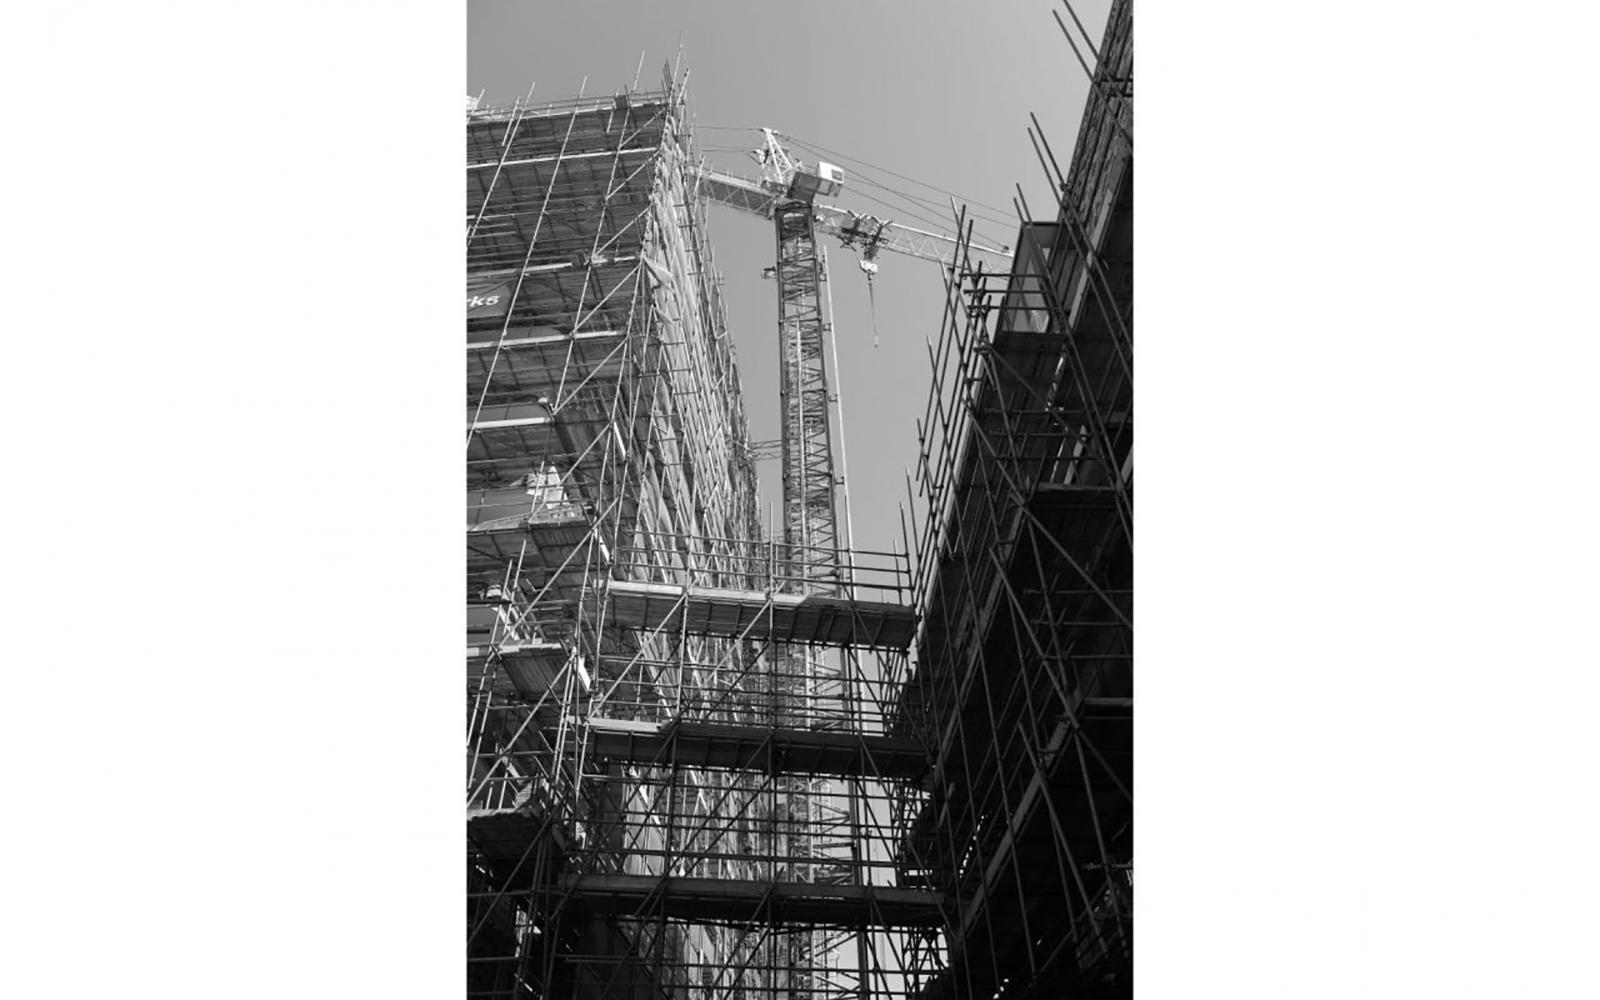 Picuskade bouw